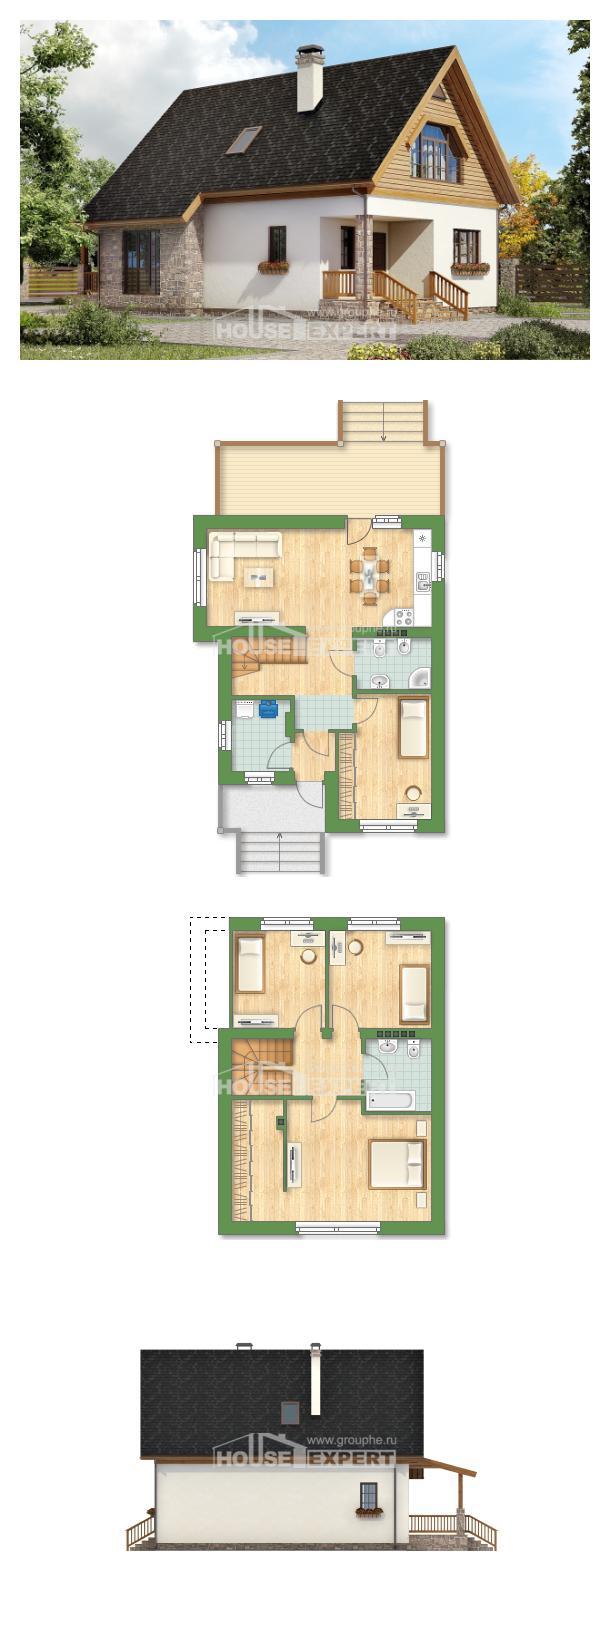 Проект дома 140-001-Л | House Expert